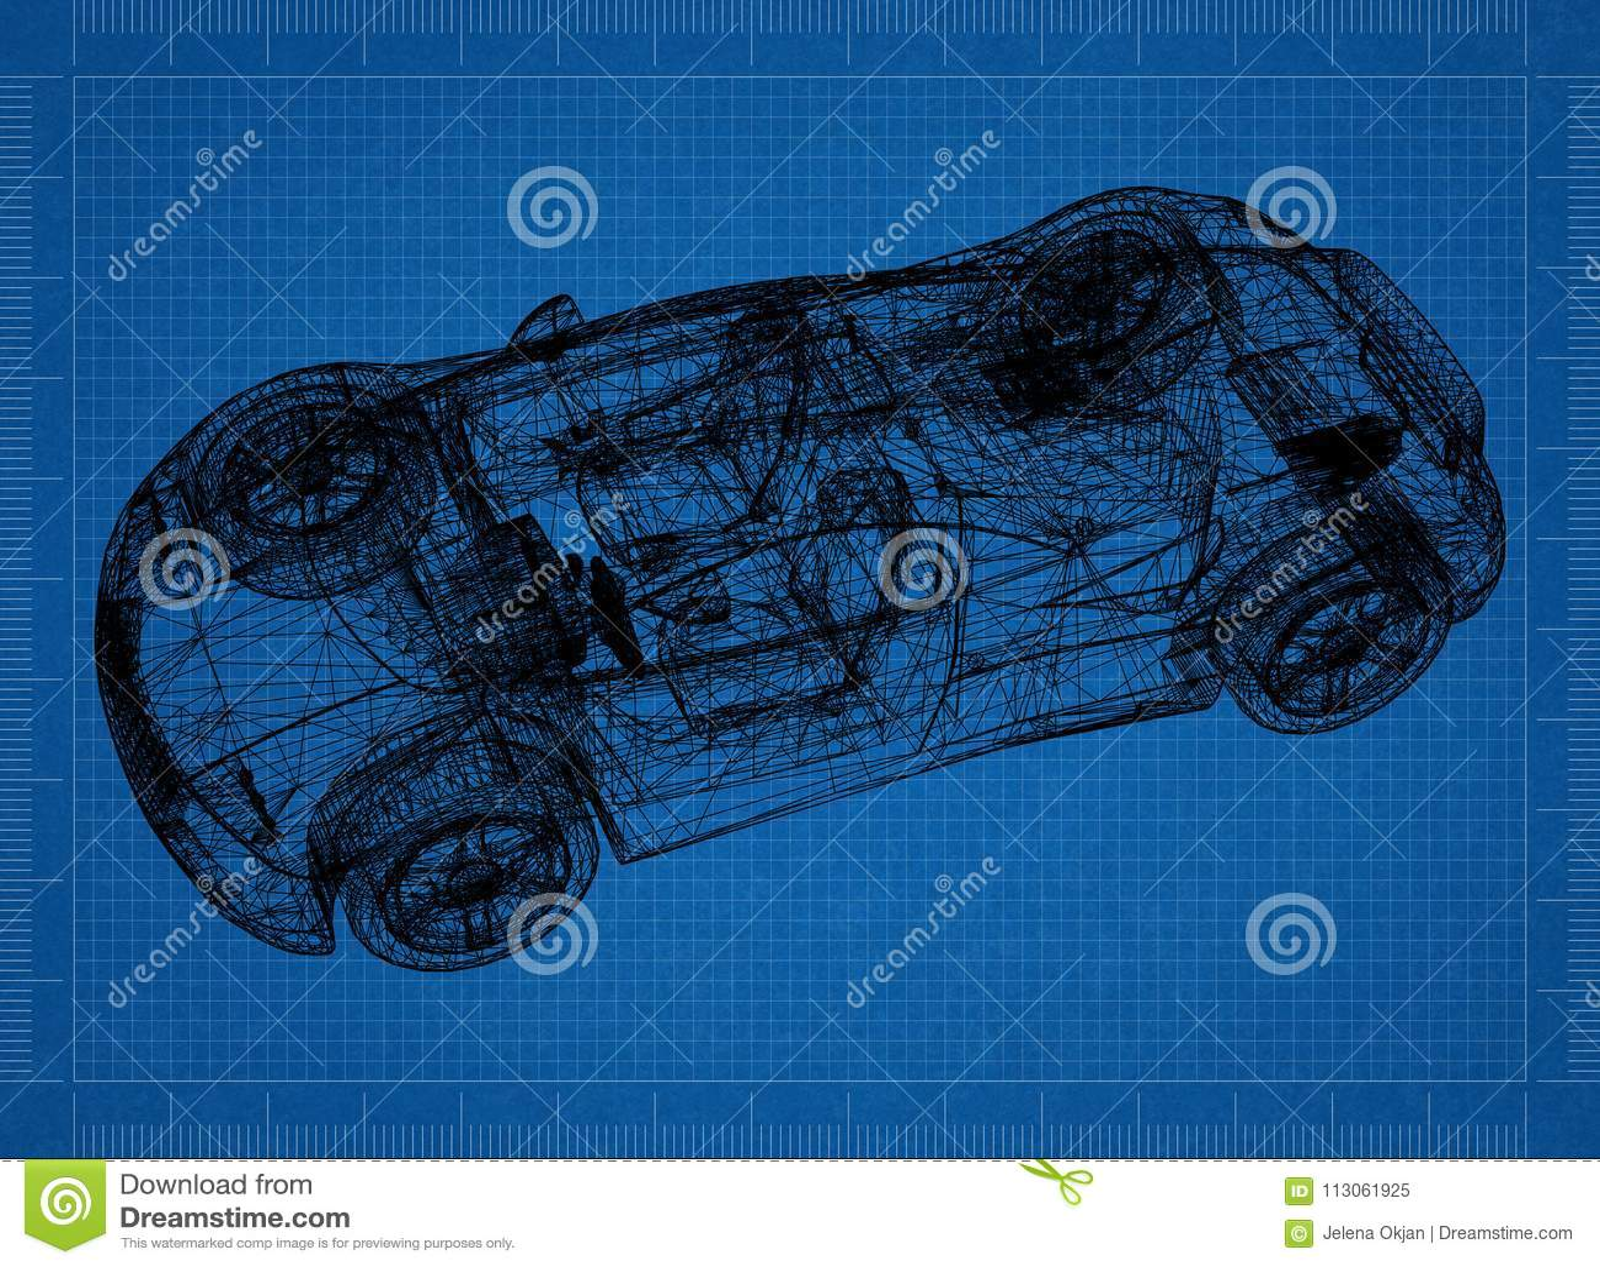 Sports car 3d blueprint stock illustration illustration of royalty free stock photo malvernweather Choice Image